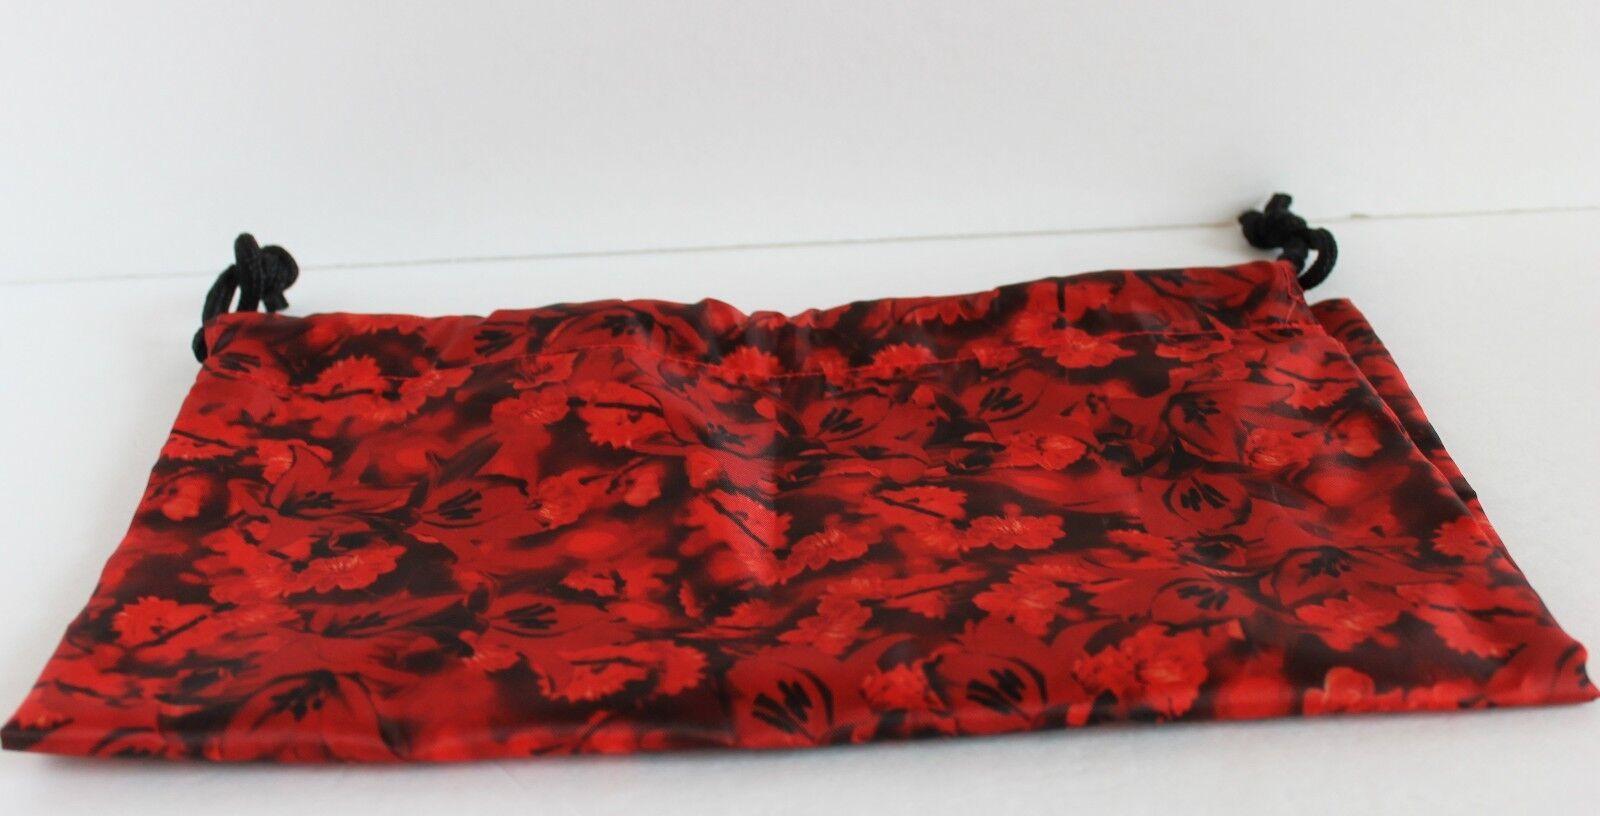 nike lotc air max 1 ultra lotc nike qs shanghai stadt packung rote sz 8 floral [747105-600] 353500